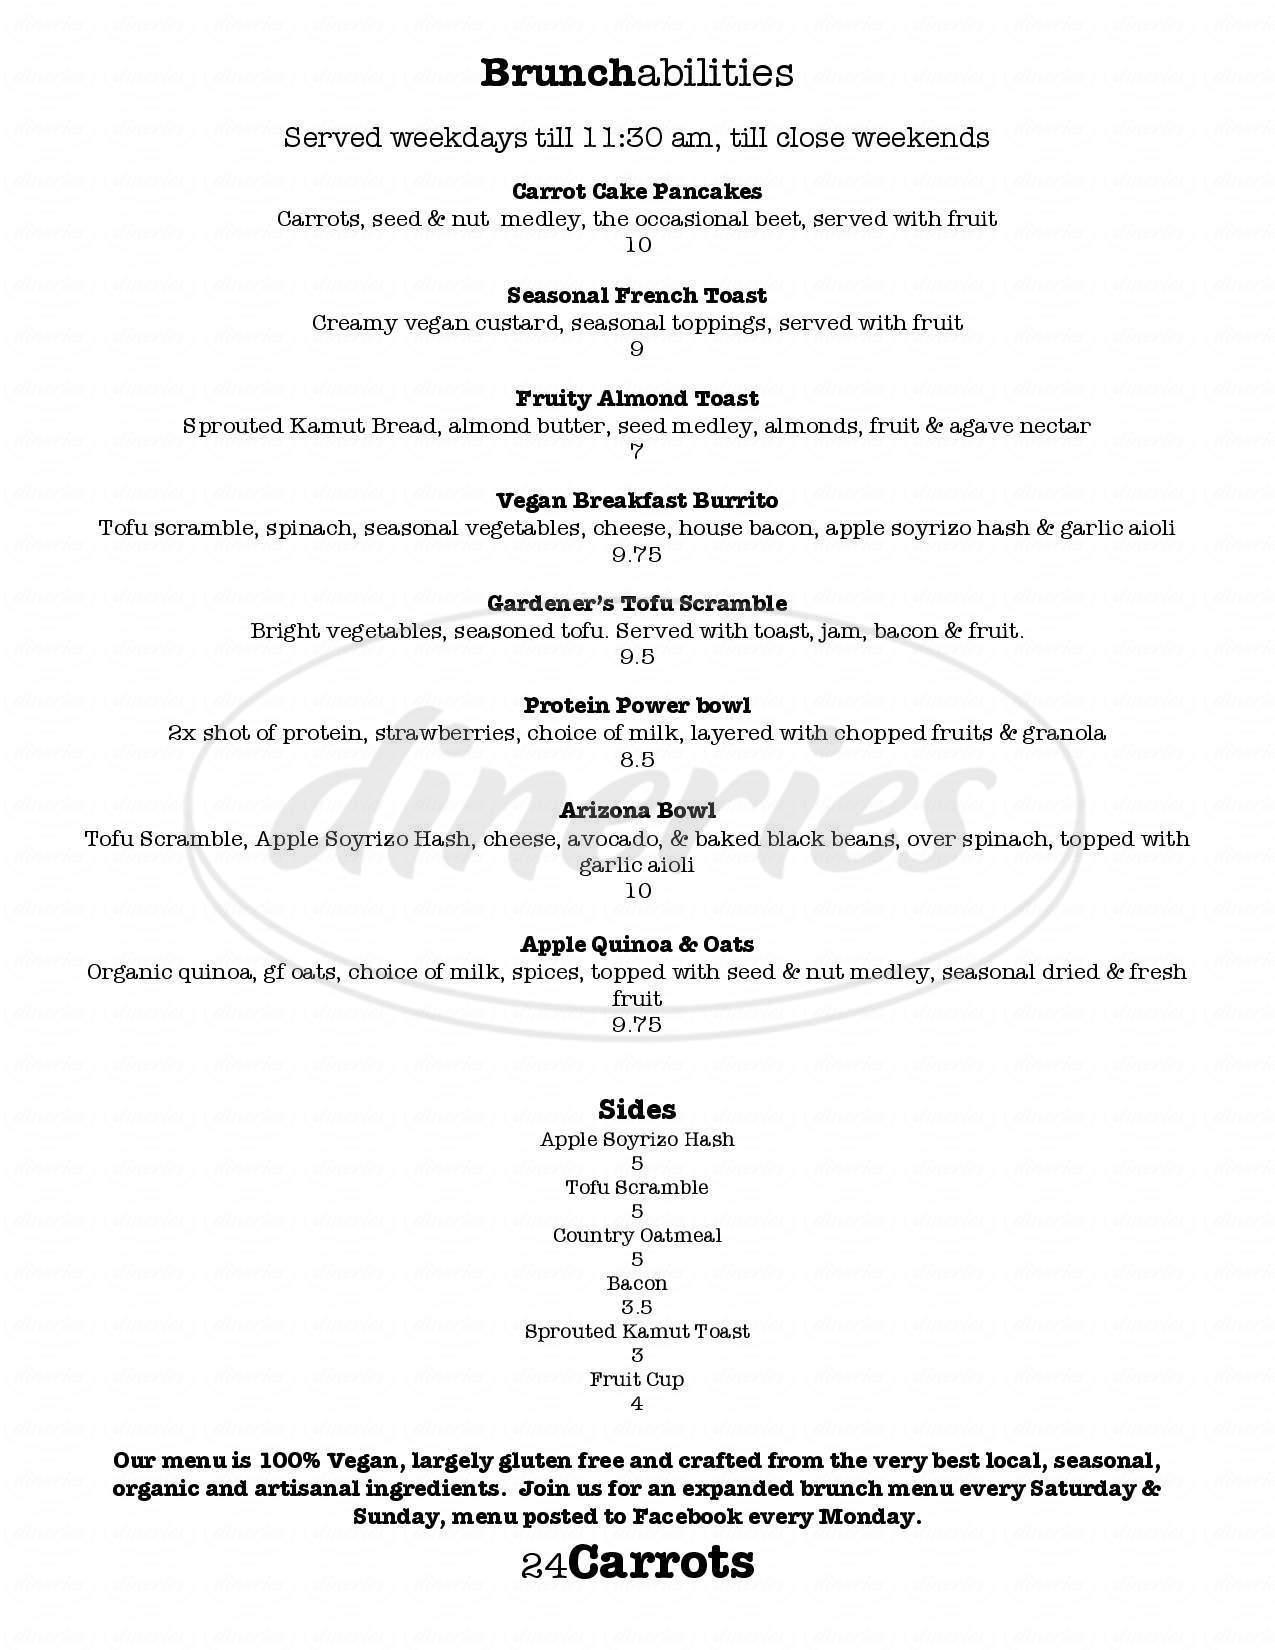 menu for 24 Carrots Juice Bar & Cafe